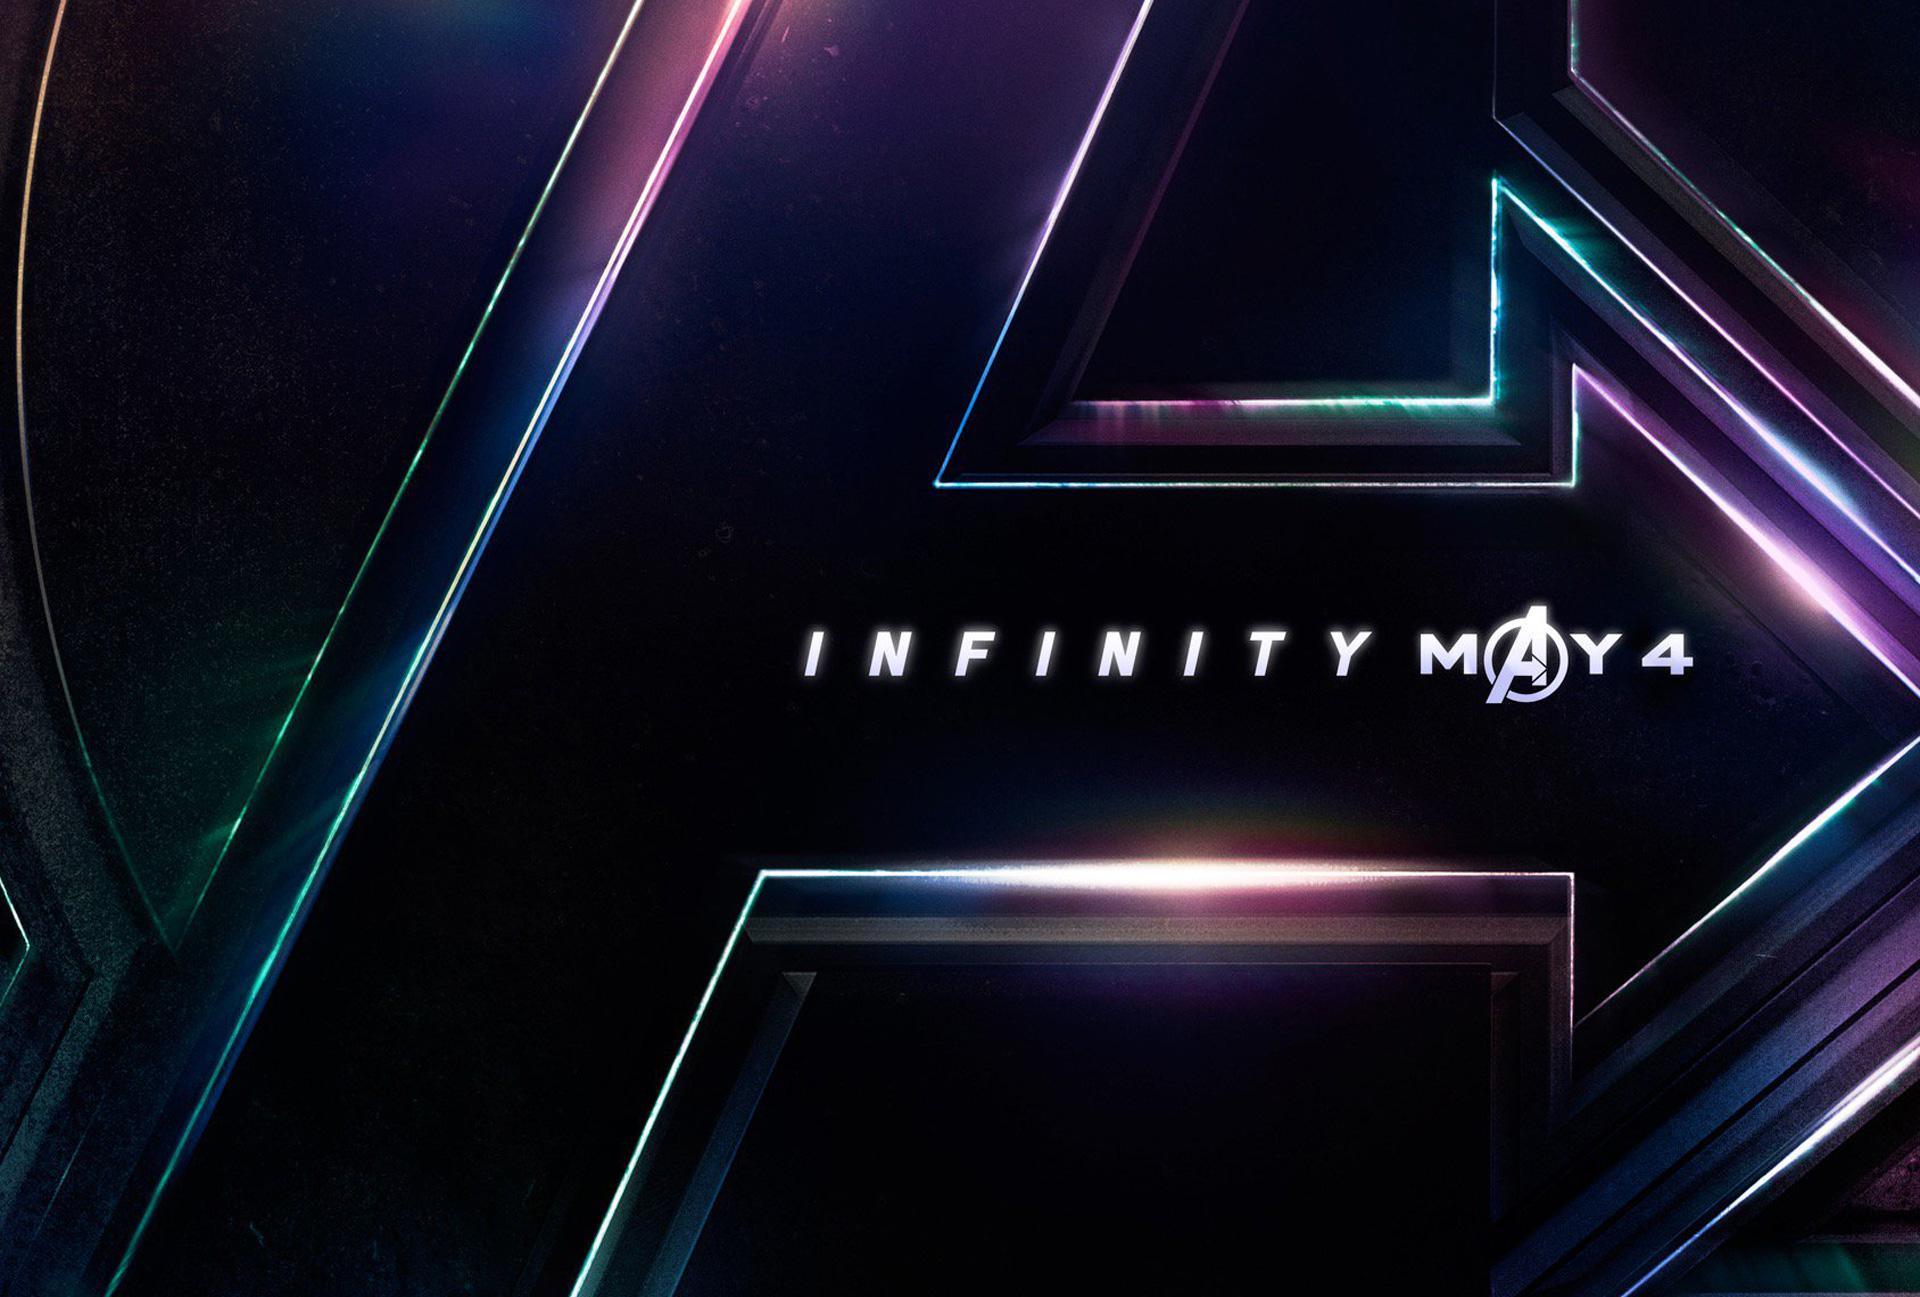 Avengers infinity war poster hd movies 4k wallpapers - Avengers a logo 4k ...